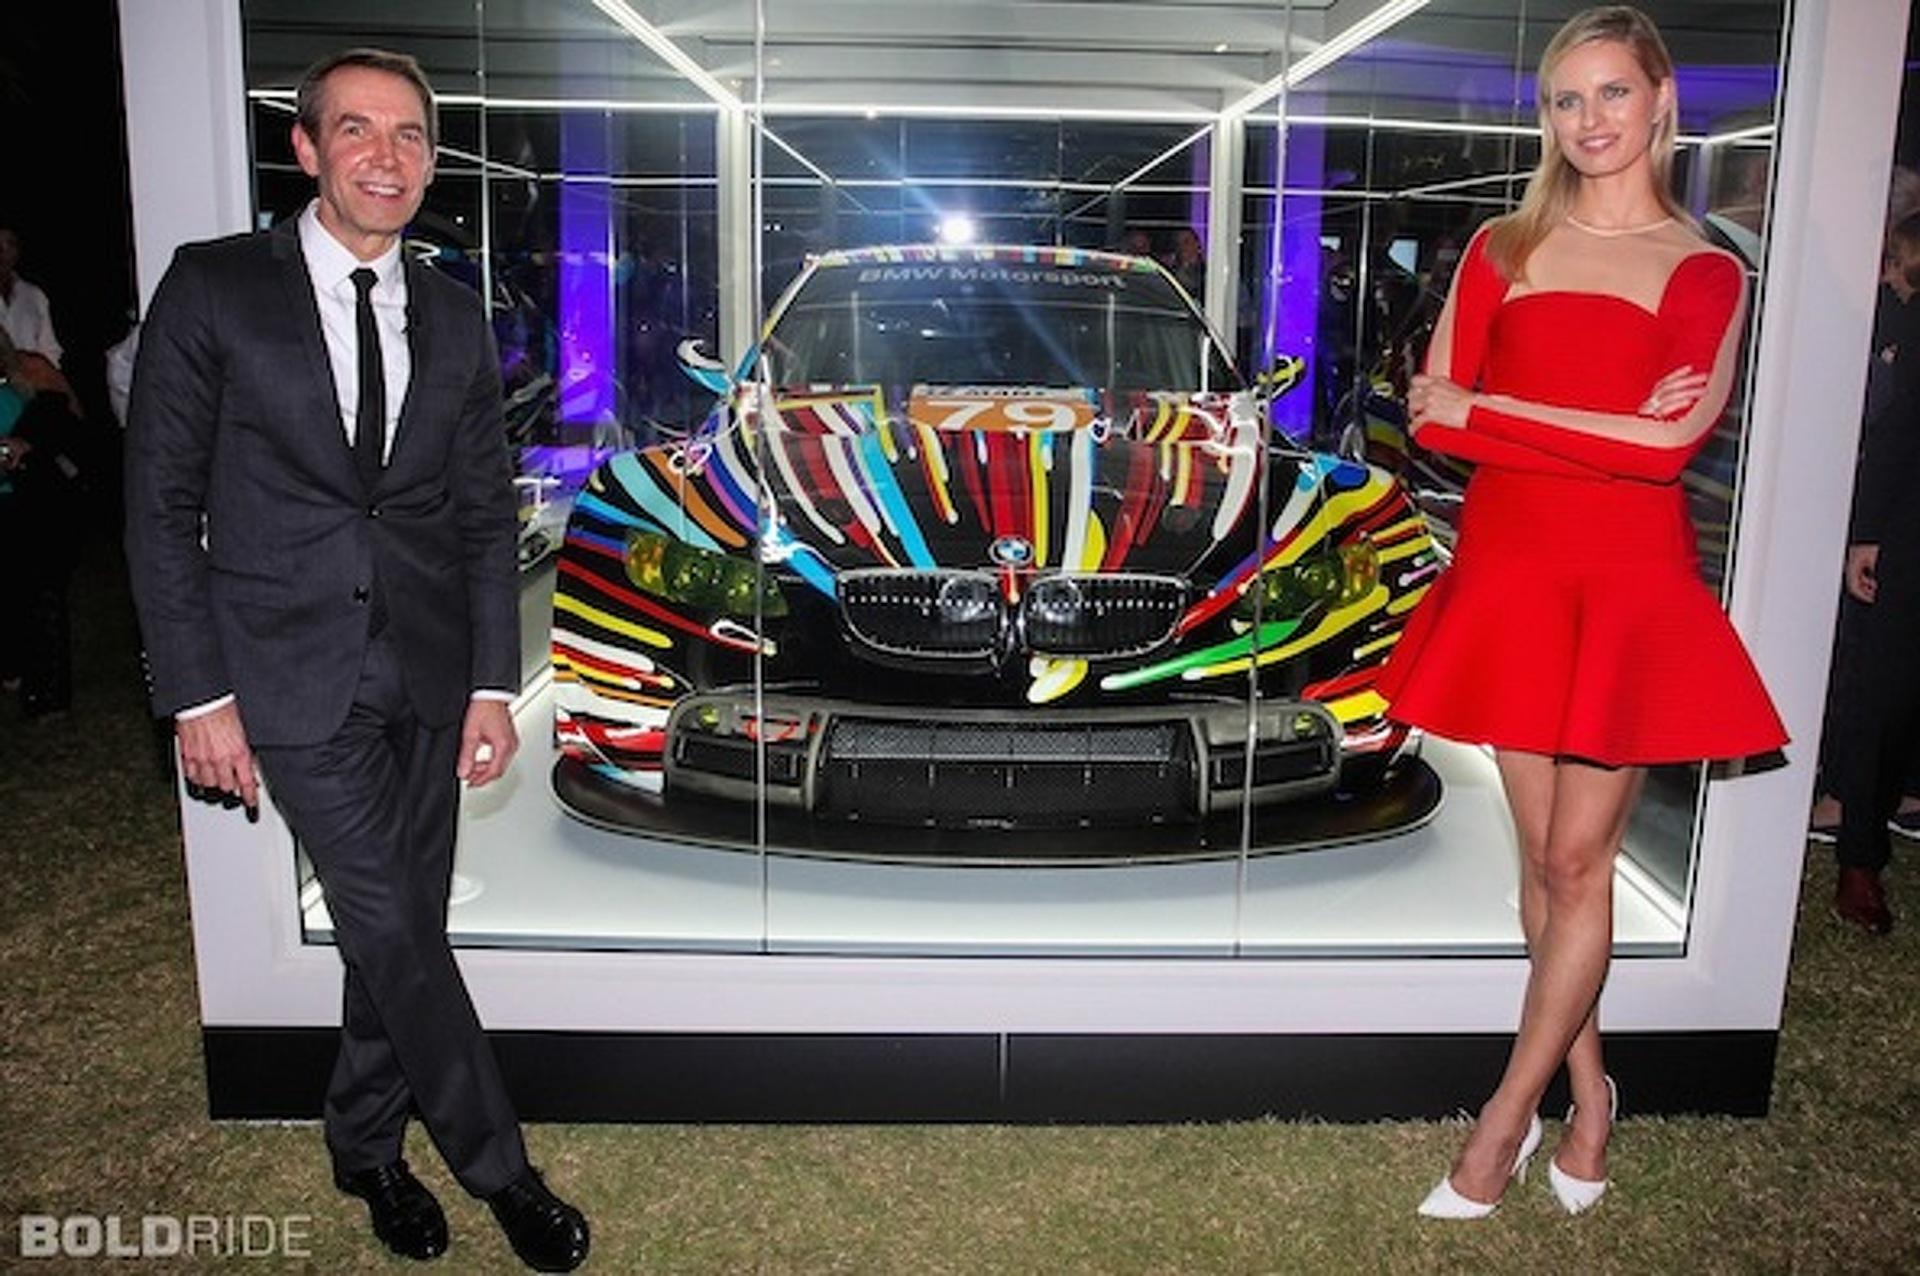 Jeff Koons BMW M3 Art Car Makes Bittersweet Debut in Miami